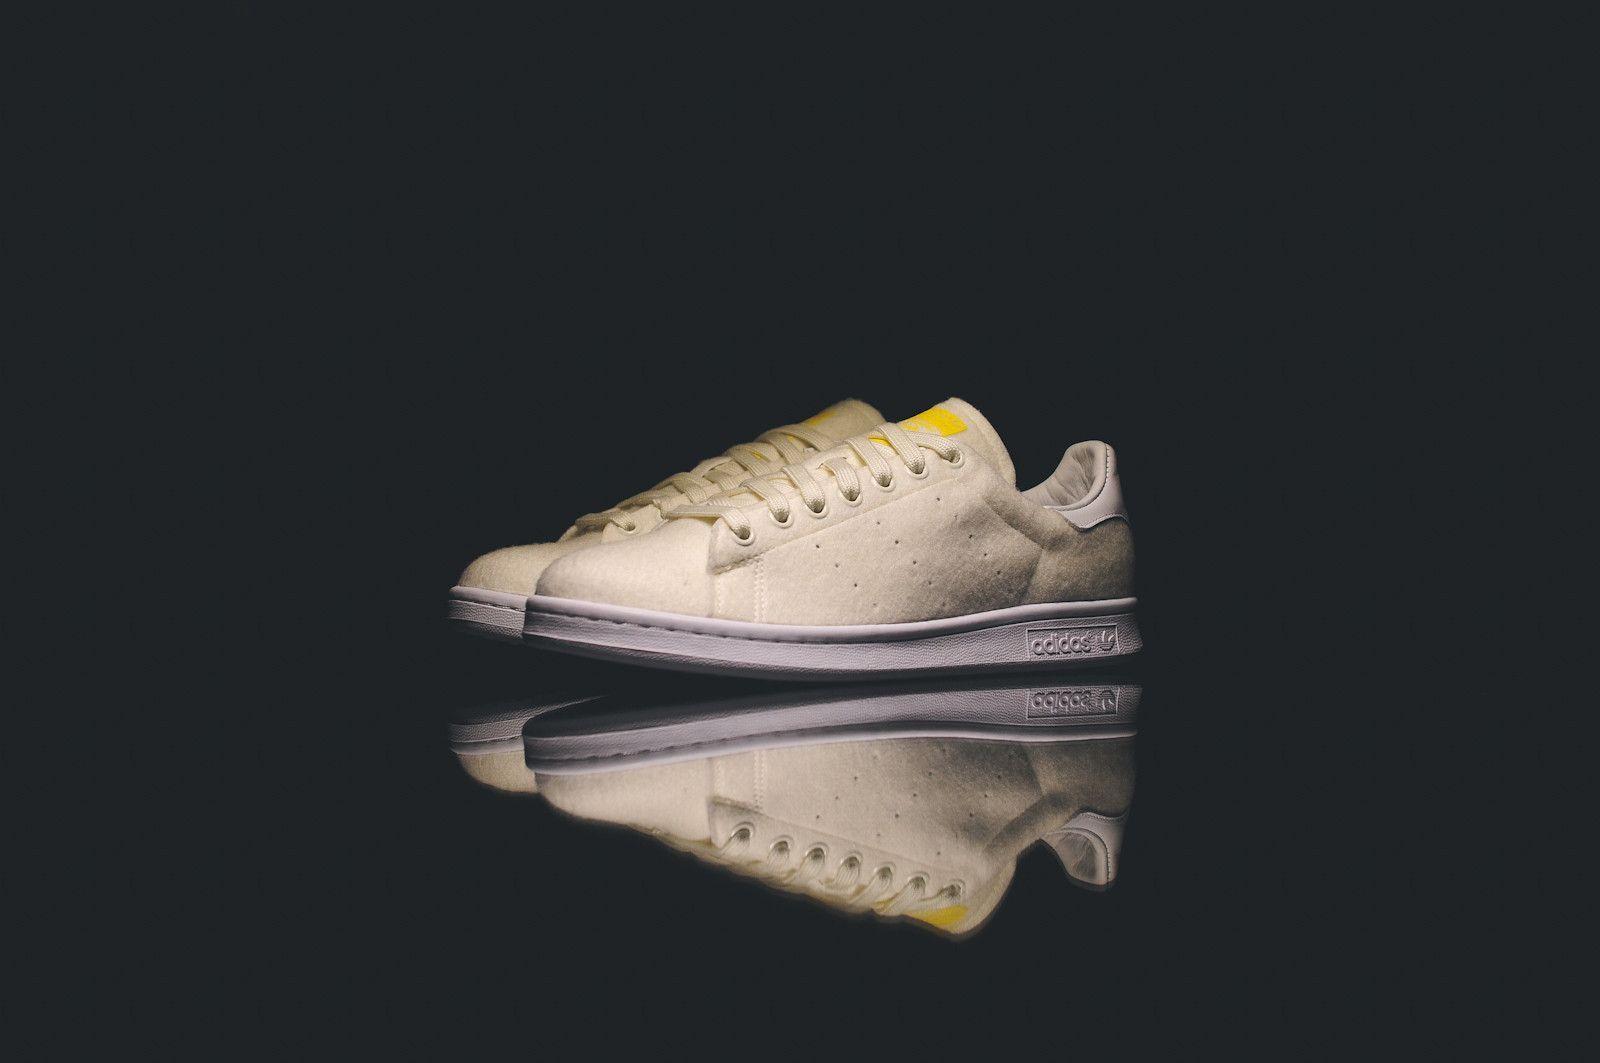 Adidas originali x pharrell williams stan smith